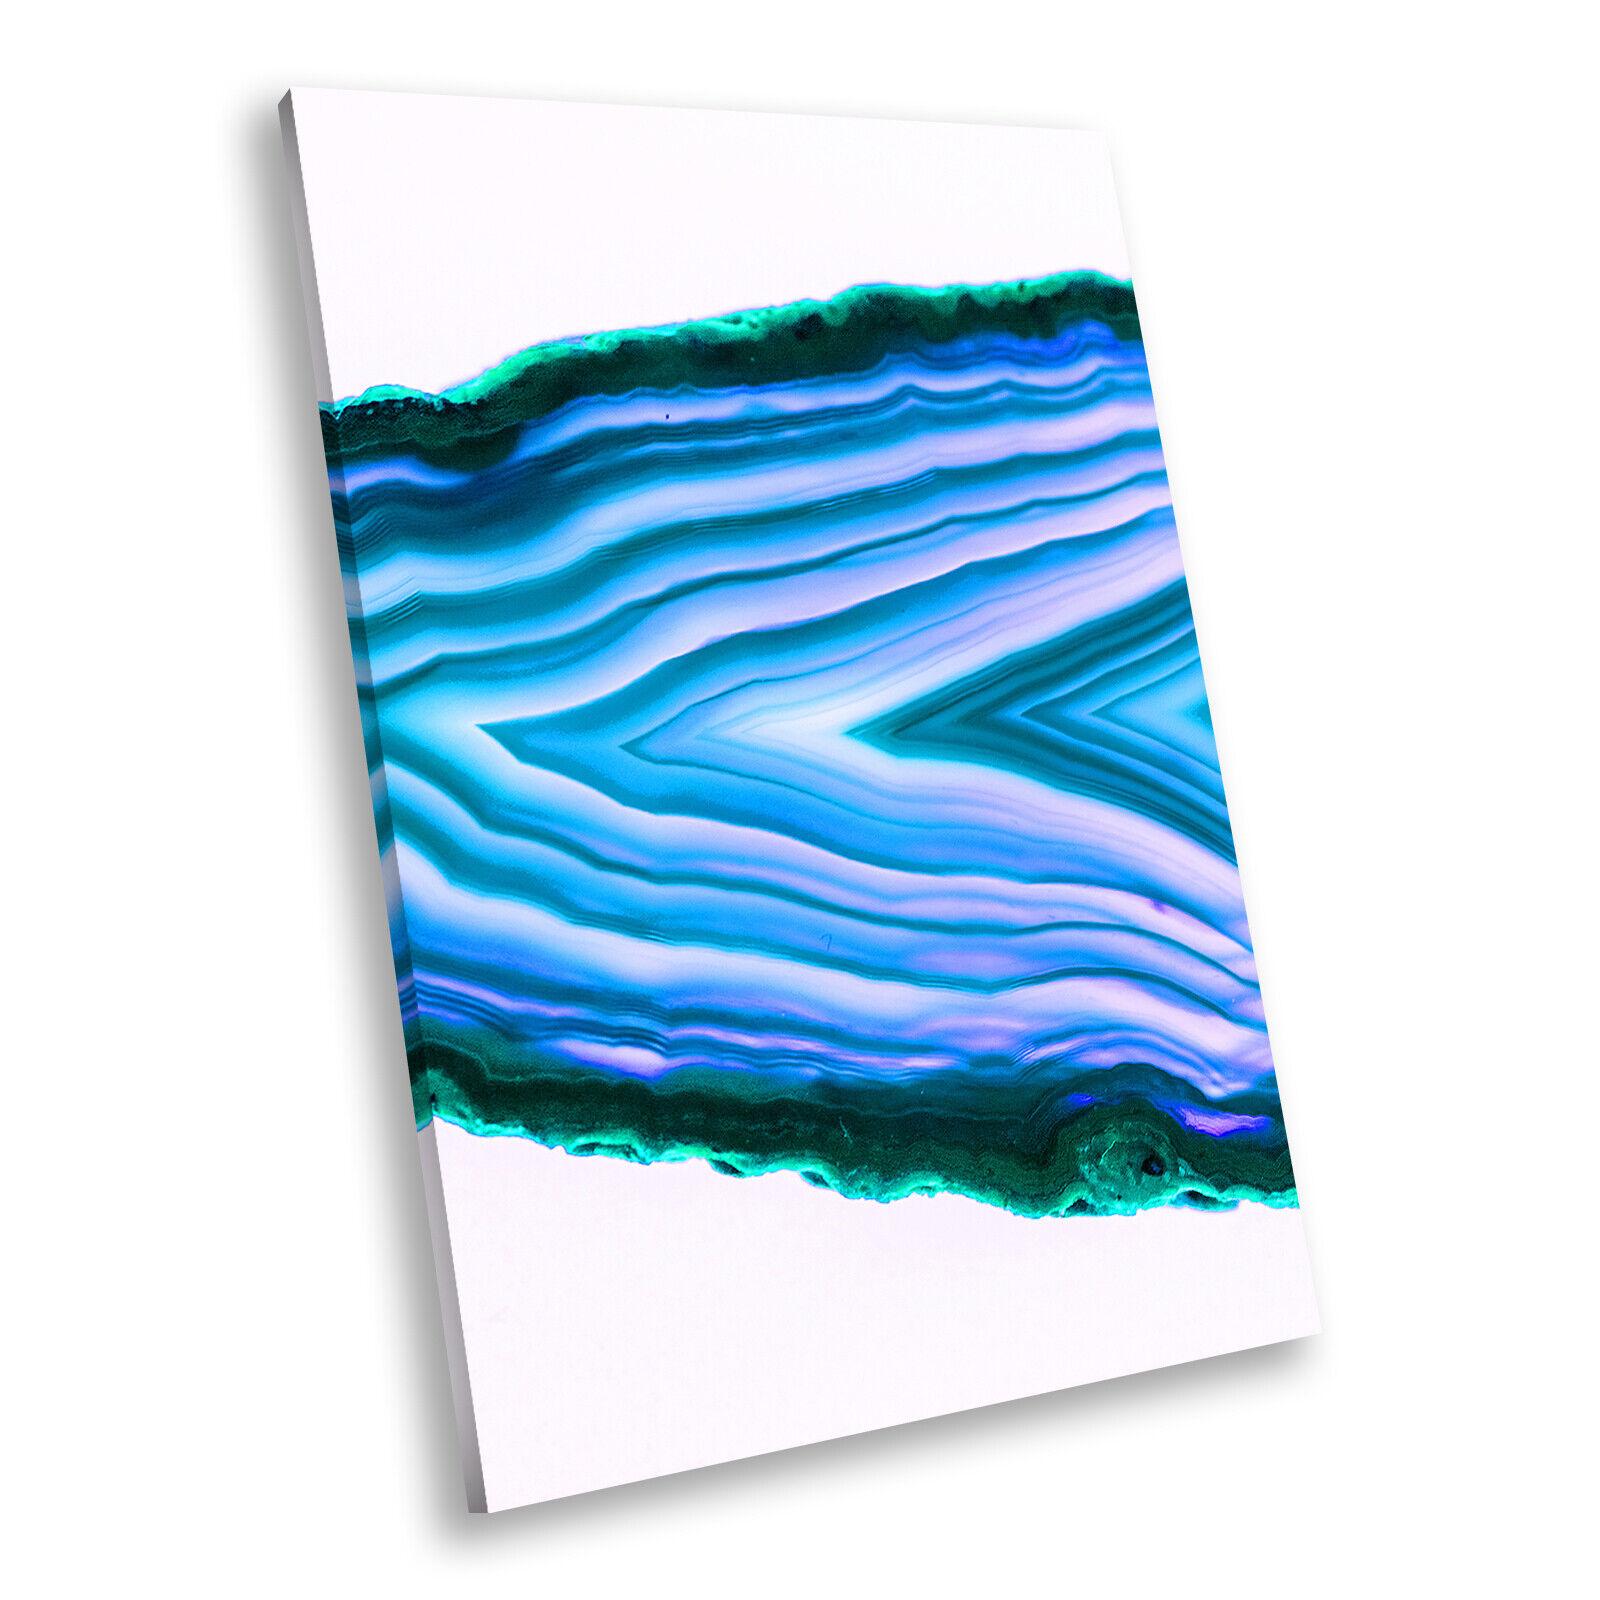 Blau Grün Weiß Portrait Abstract Canvas Framed Art Large Picture